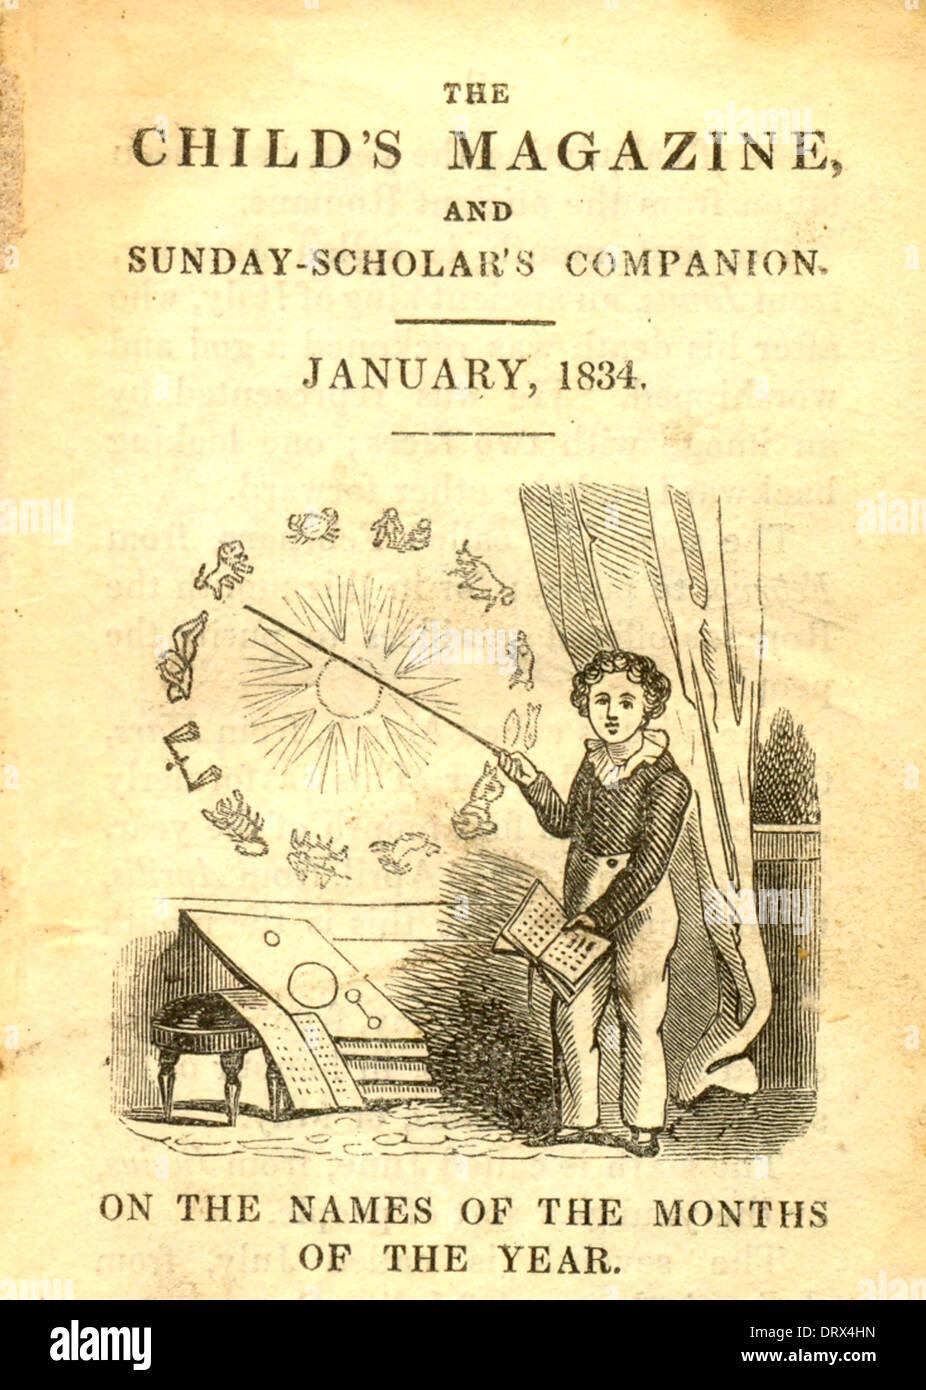 The Child's Magazine and Sunday-Scholar's Companion - Stock Image